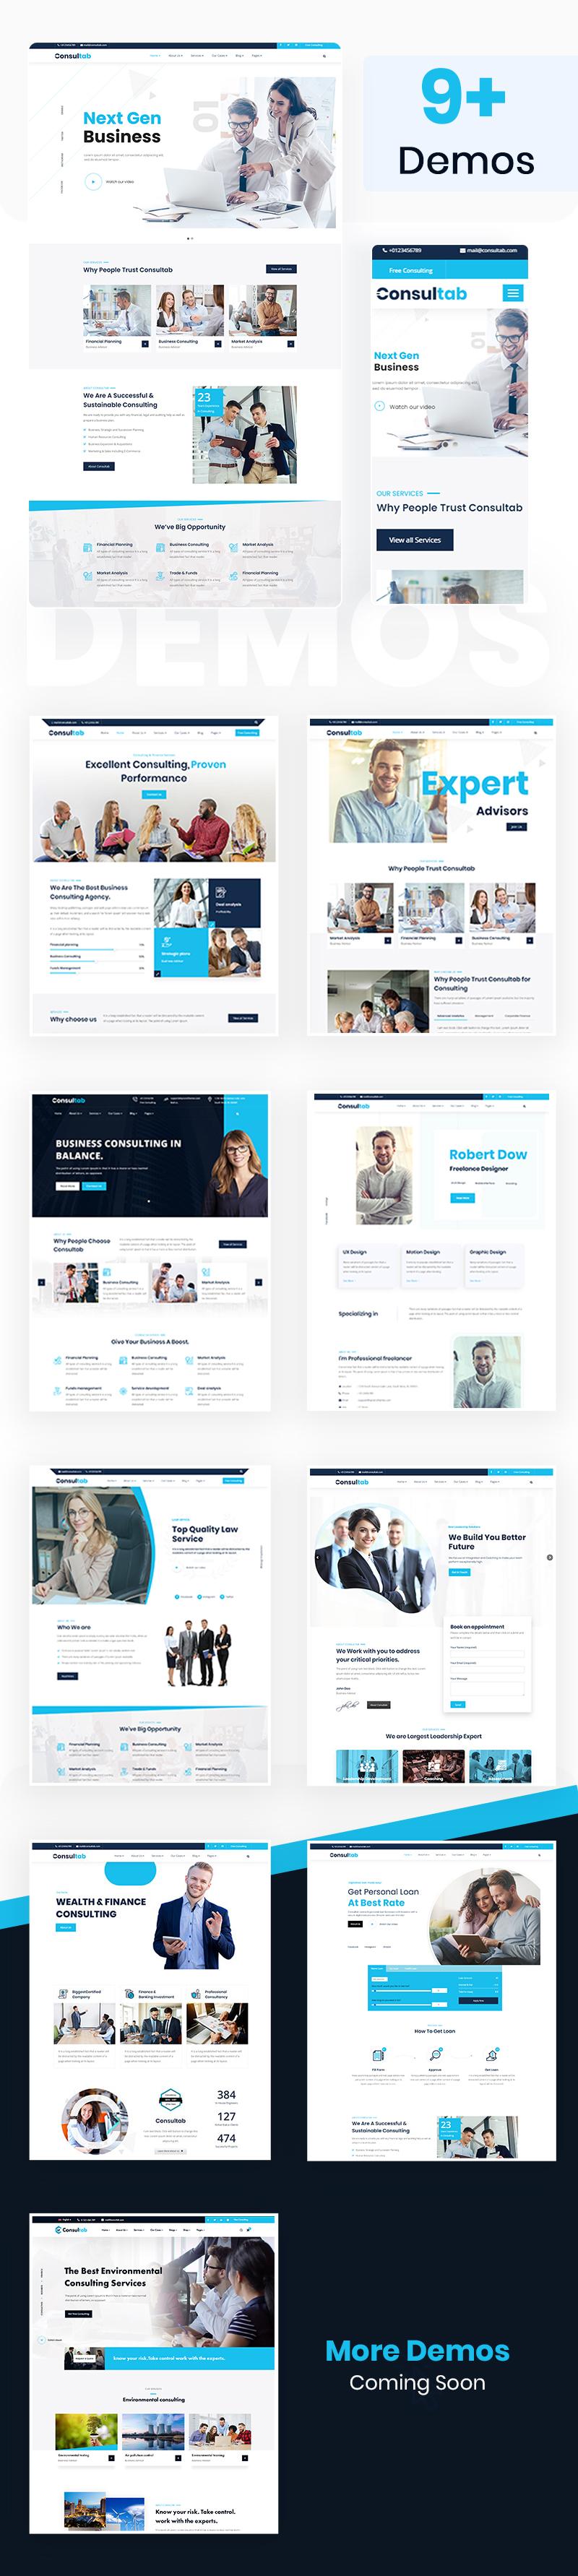 Consultab - Consulting Business & Finance WordPress Theme - 6